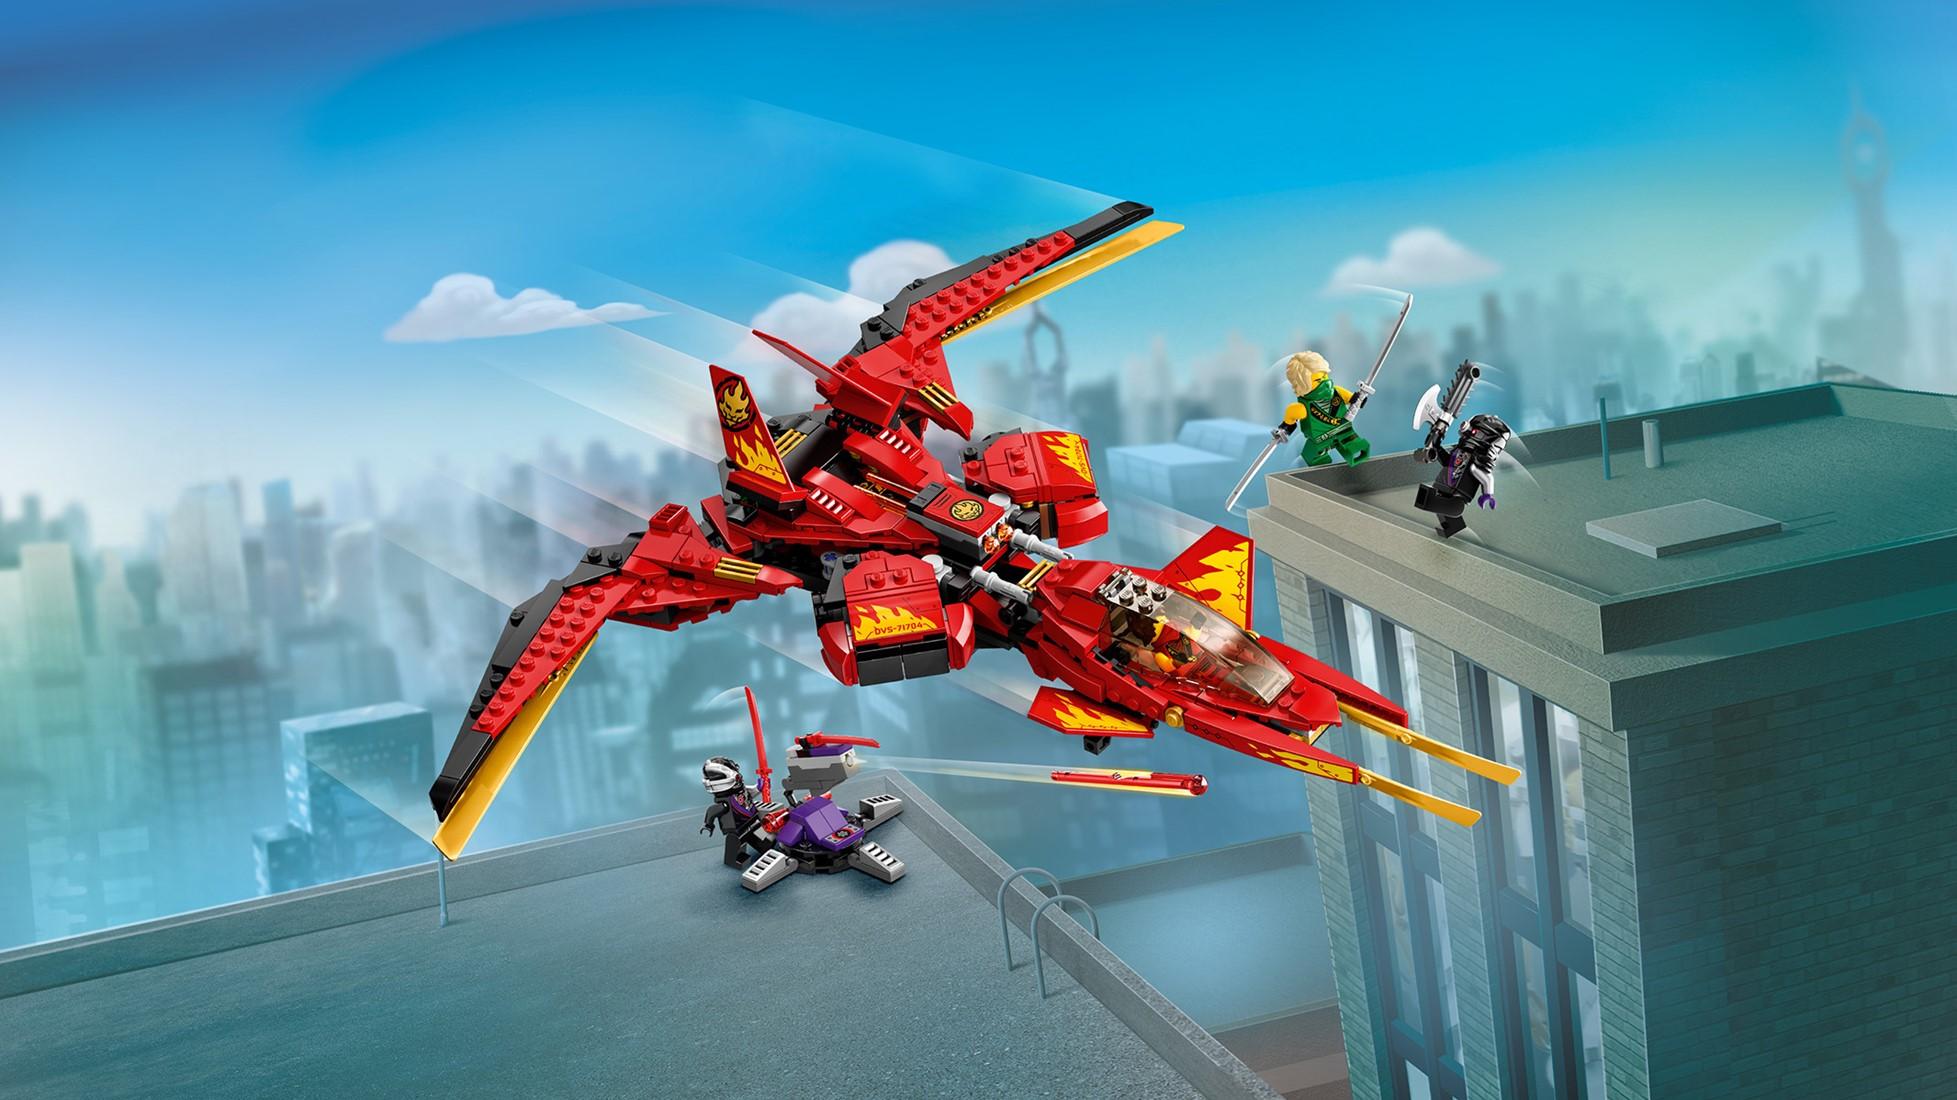 LEGO NINJAGO® 71704 Kai Fighter | Uw speelgoed en LEGO ...